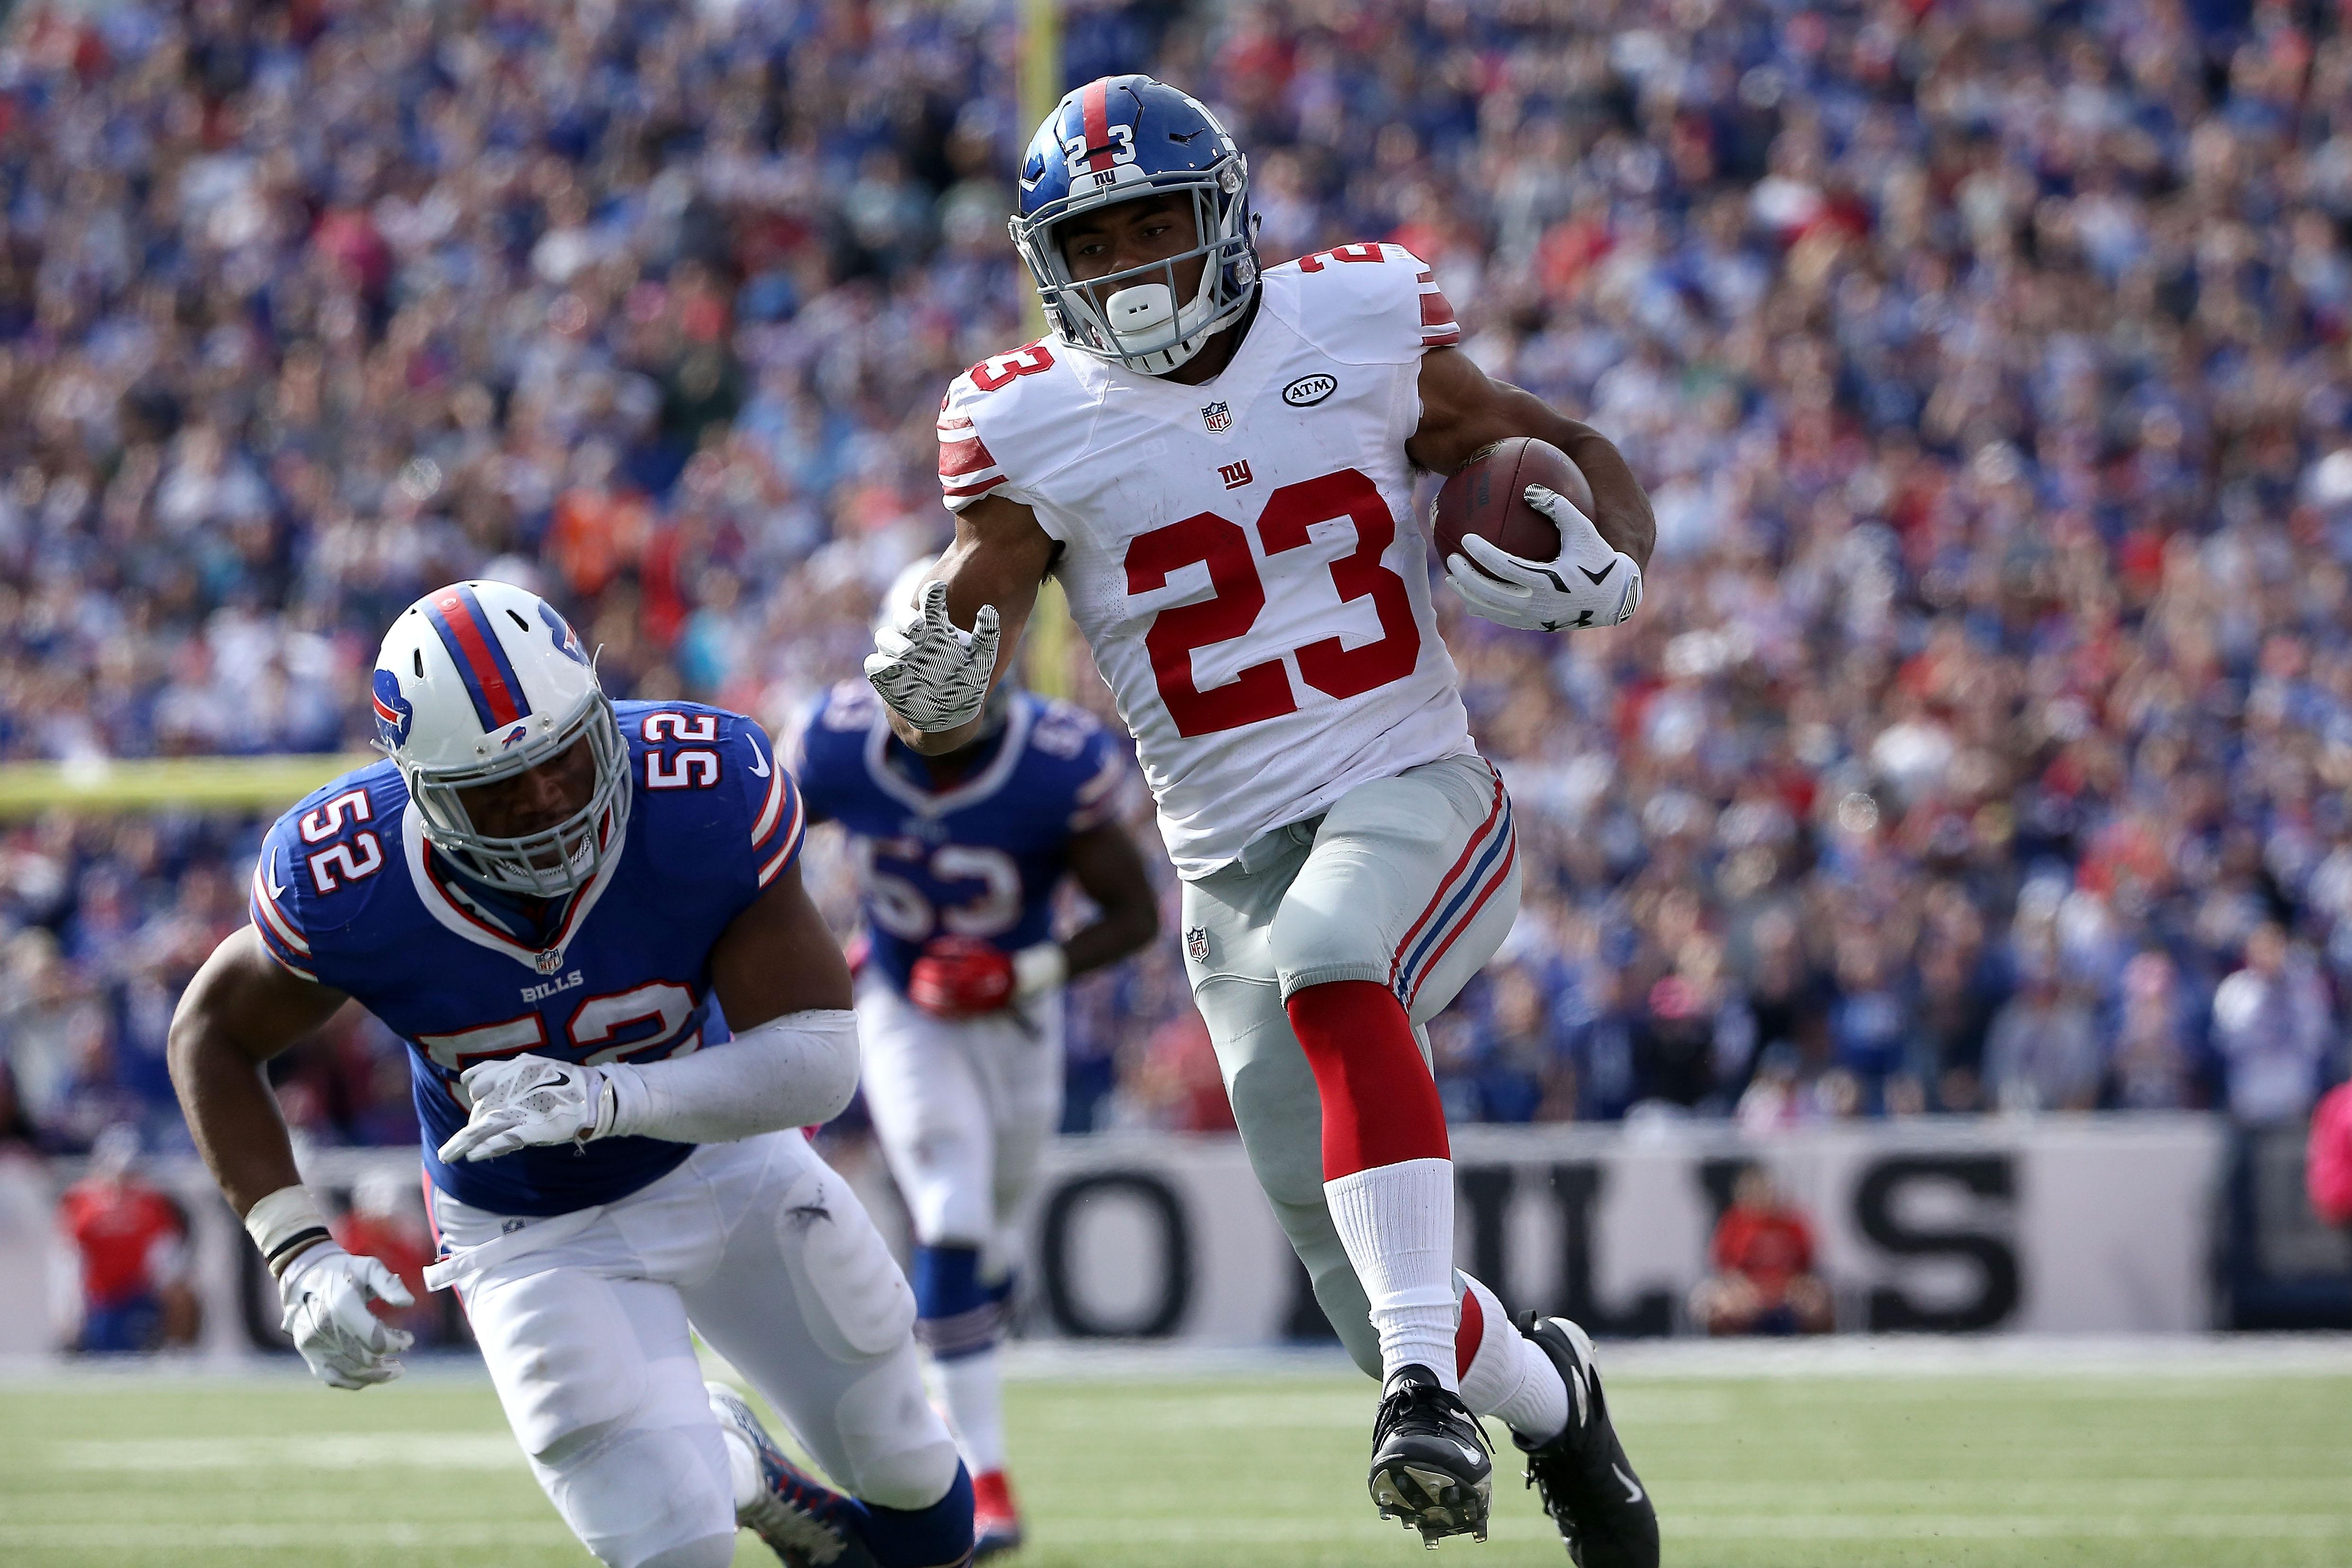 Rashad Jennings en route to a 51-yard fourth-quarter touchdown